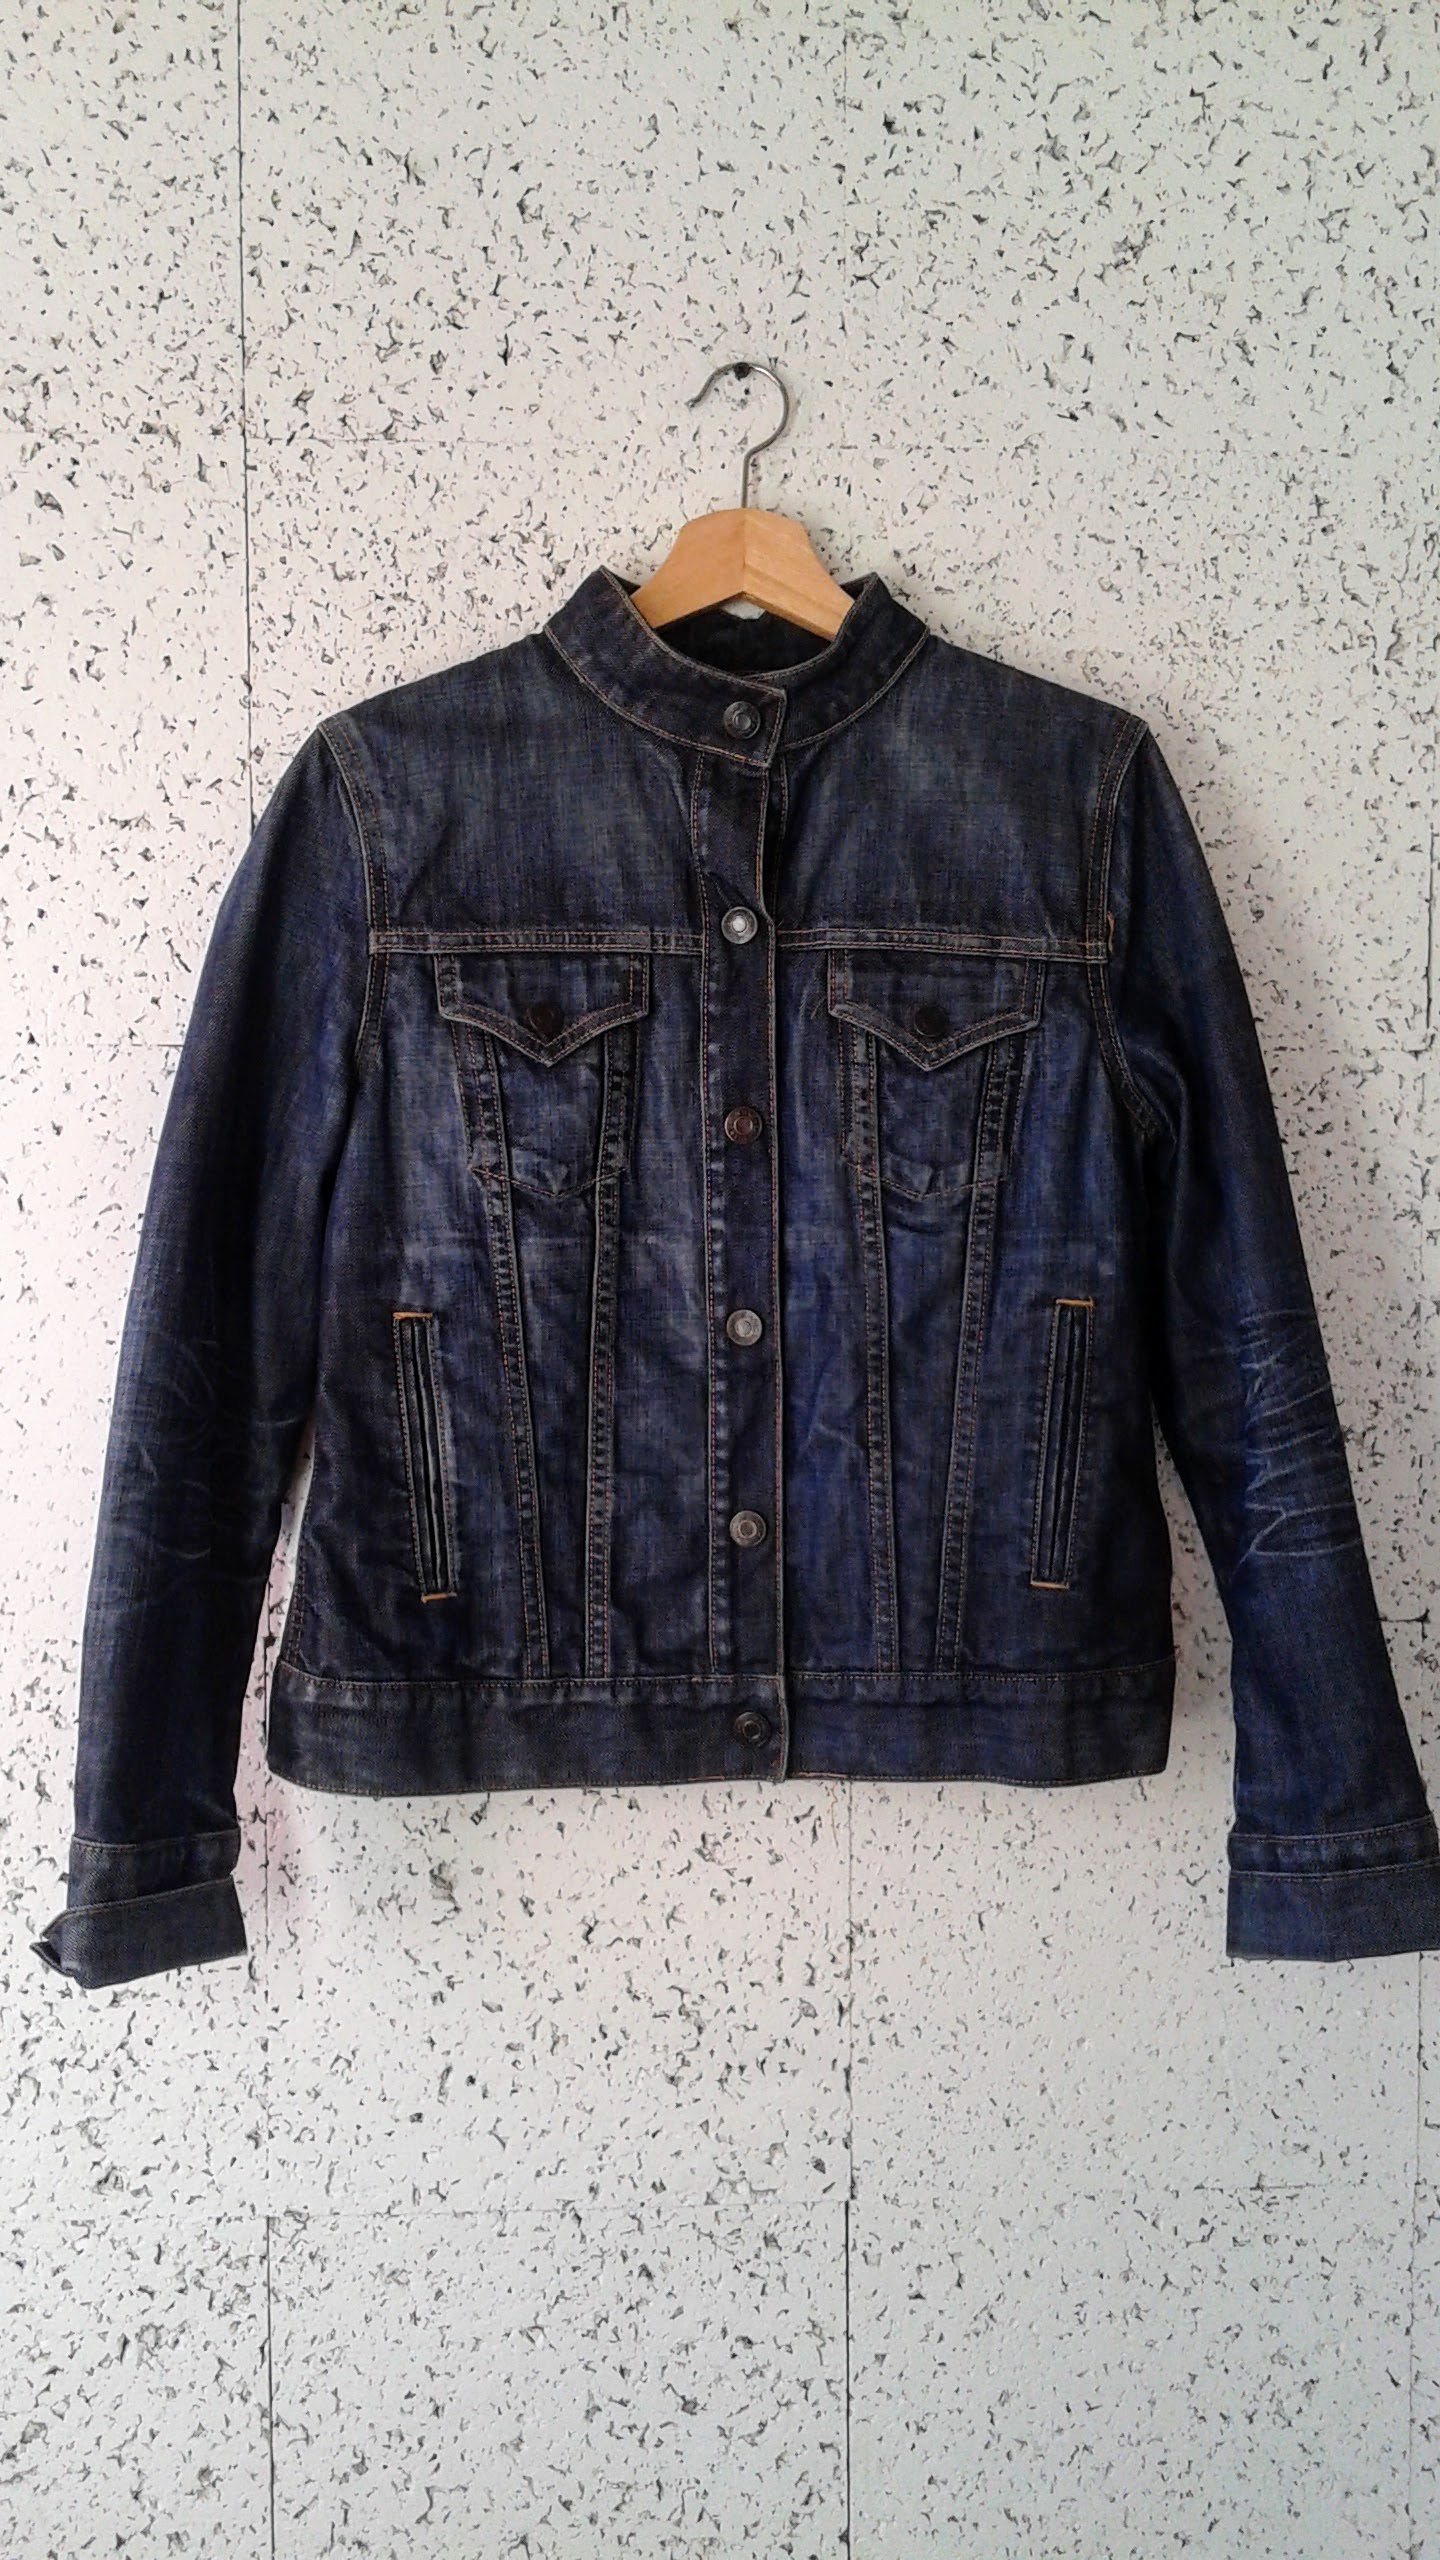 Gap  jacket; Size M, $34